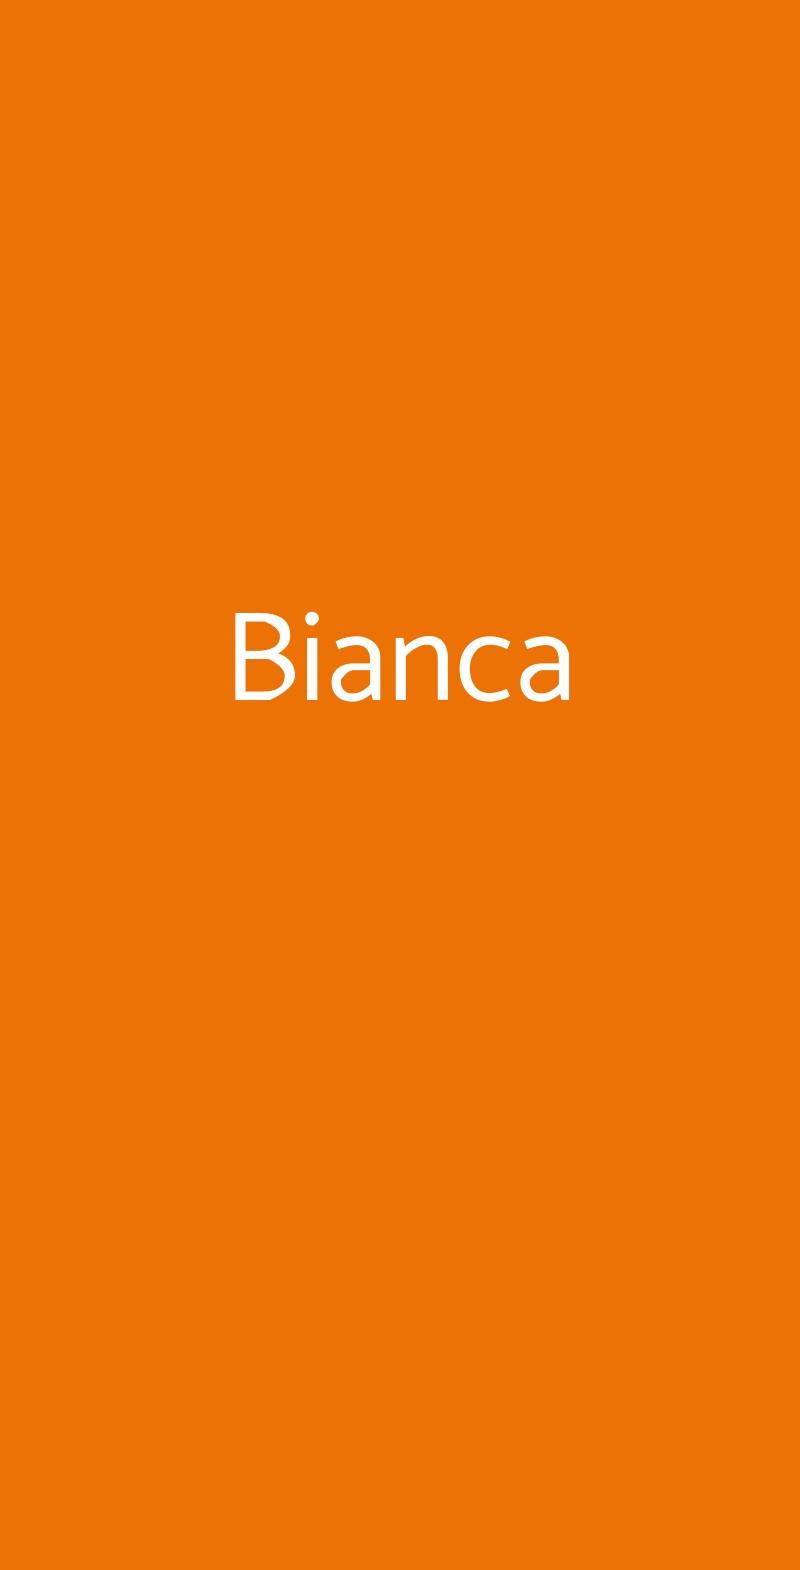 Bianca Milano menù 1 pagina